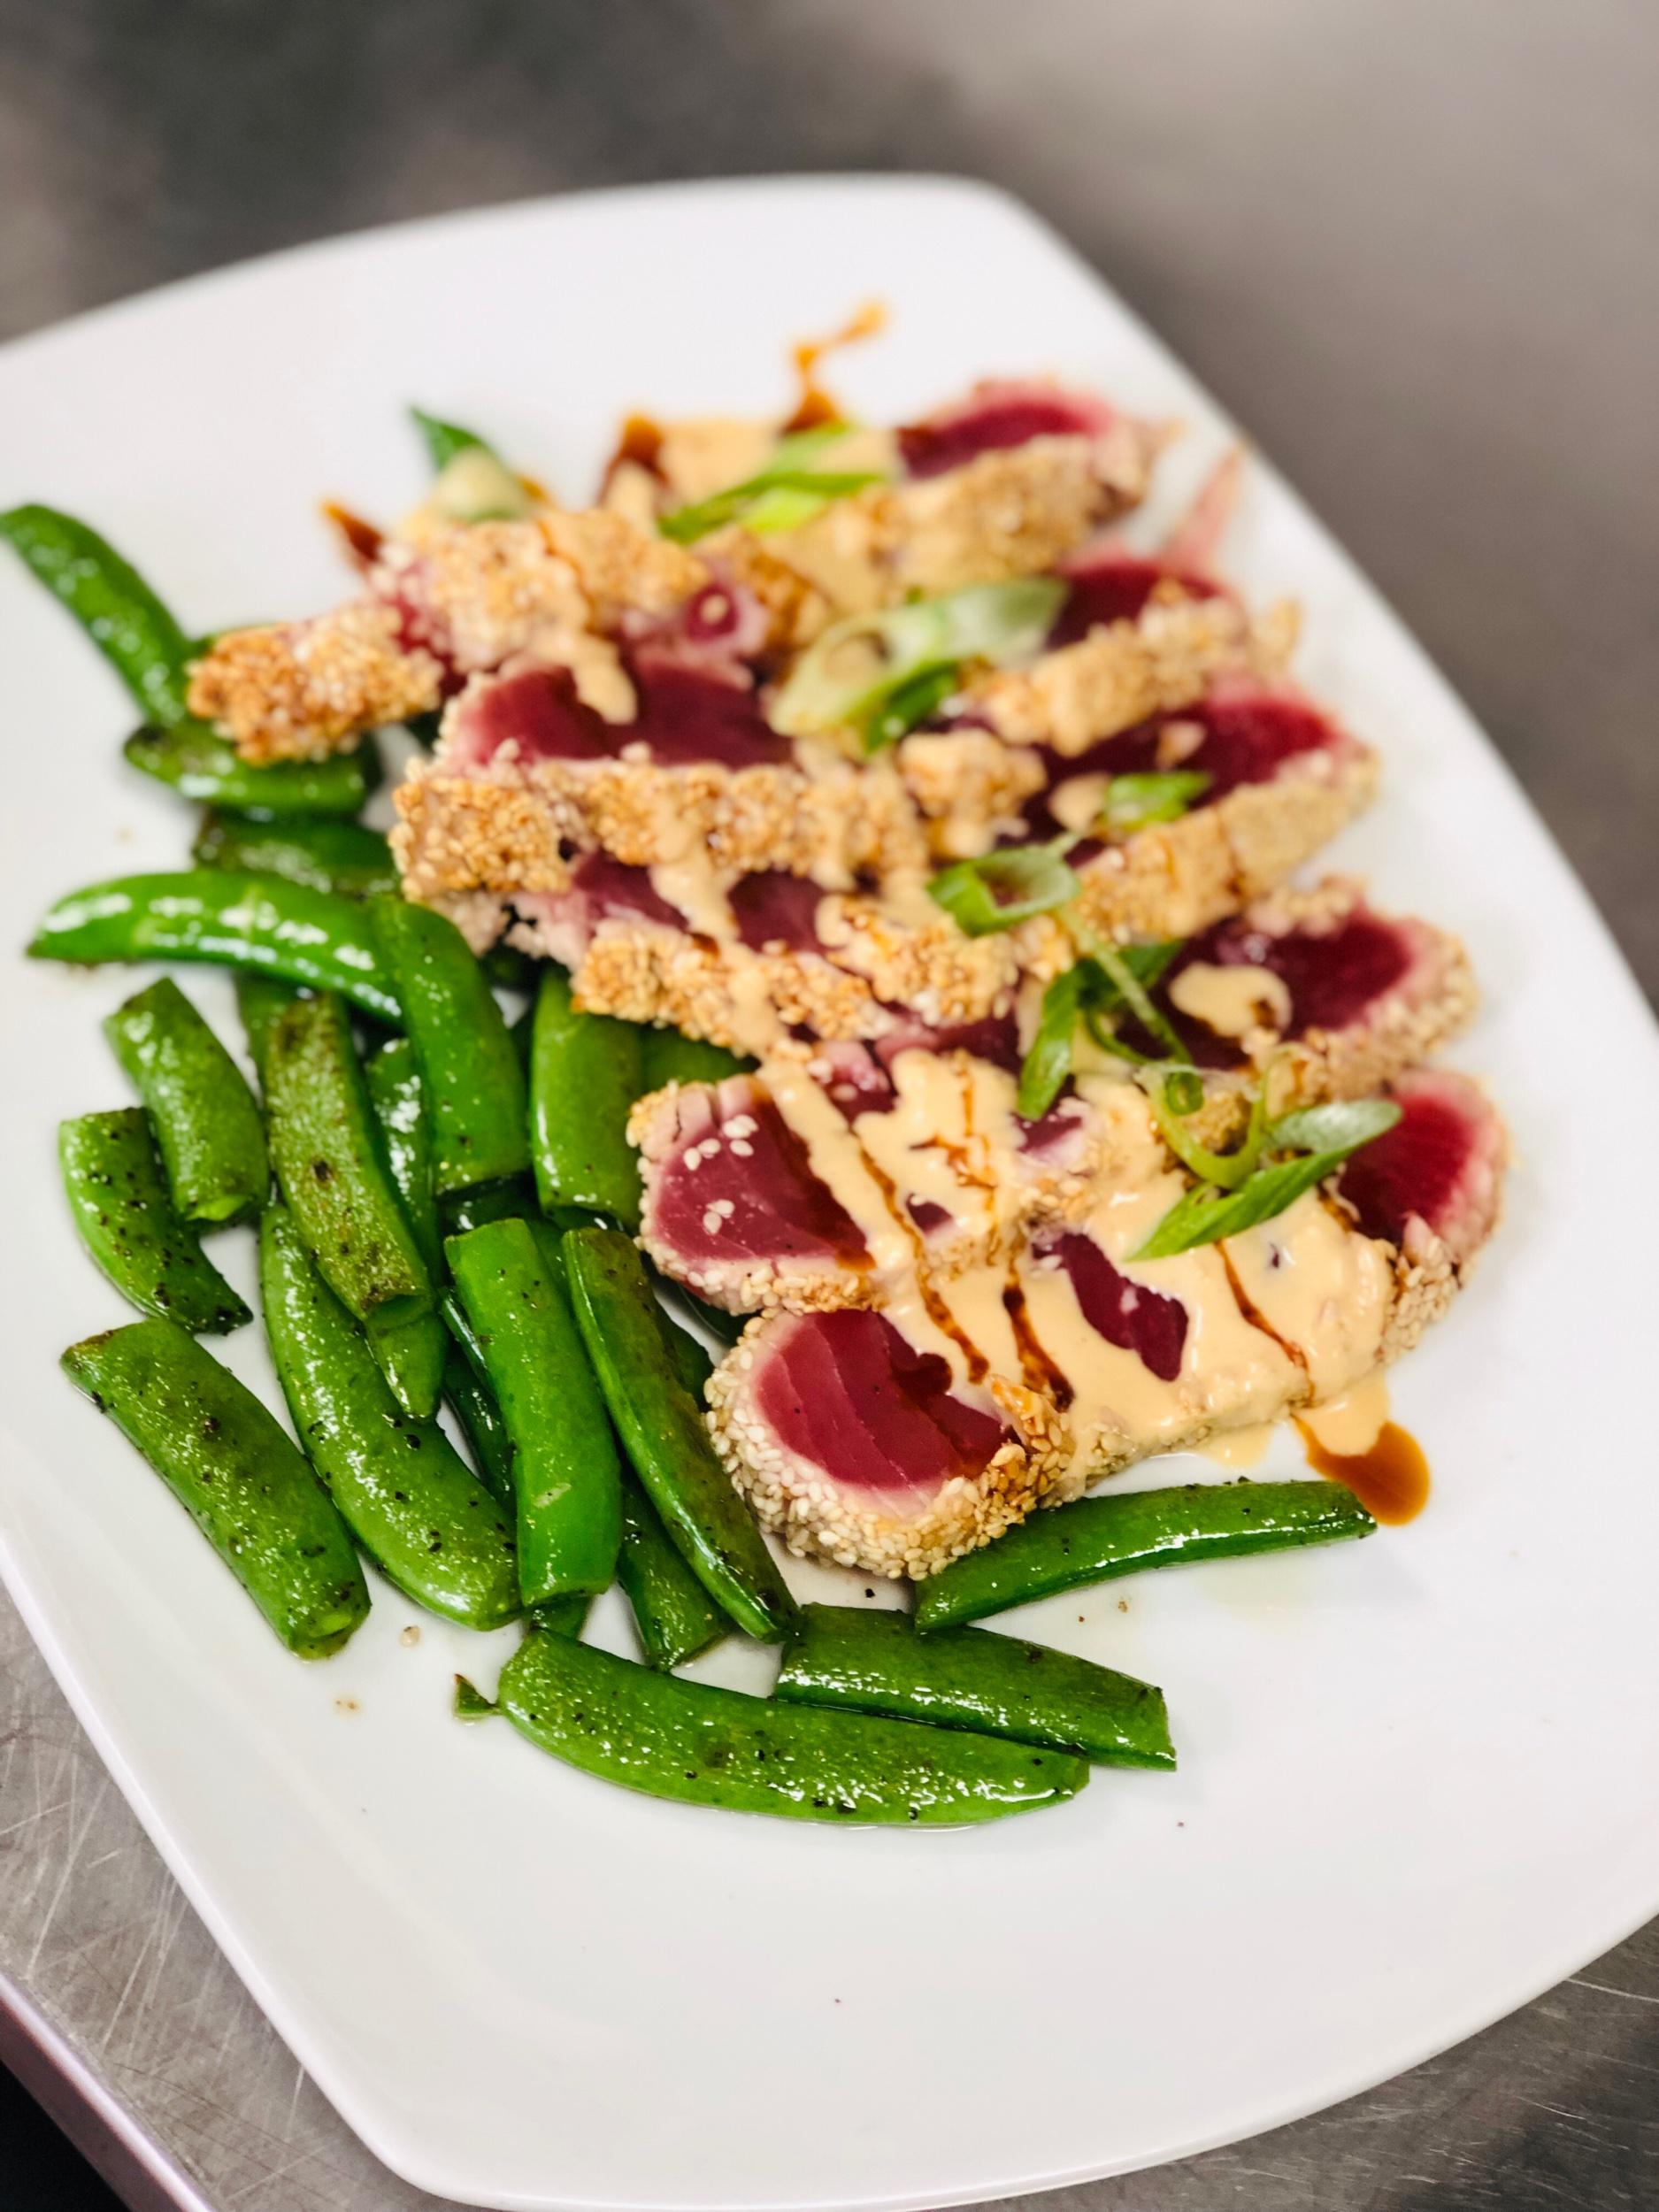 Daily Catch: Sesame Crusted Ahi Tuna